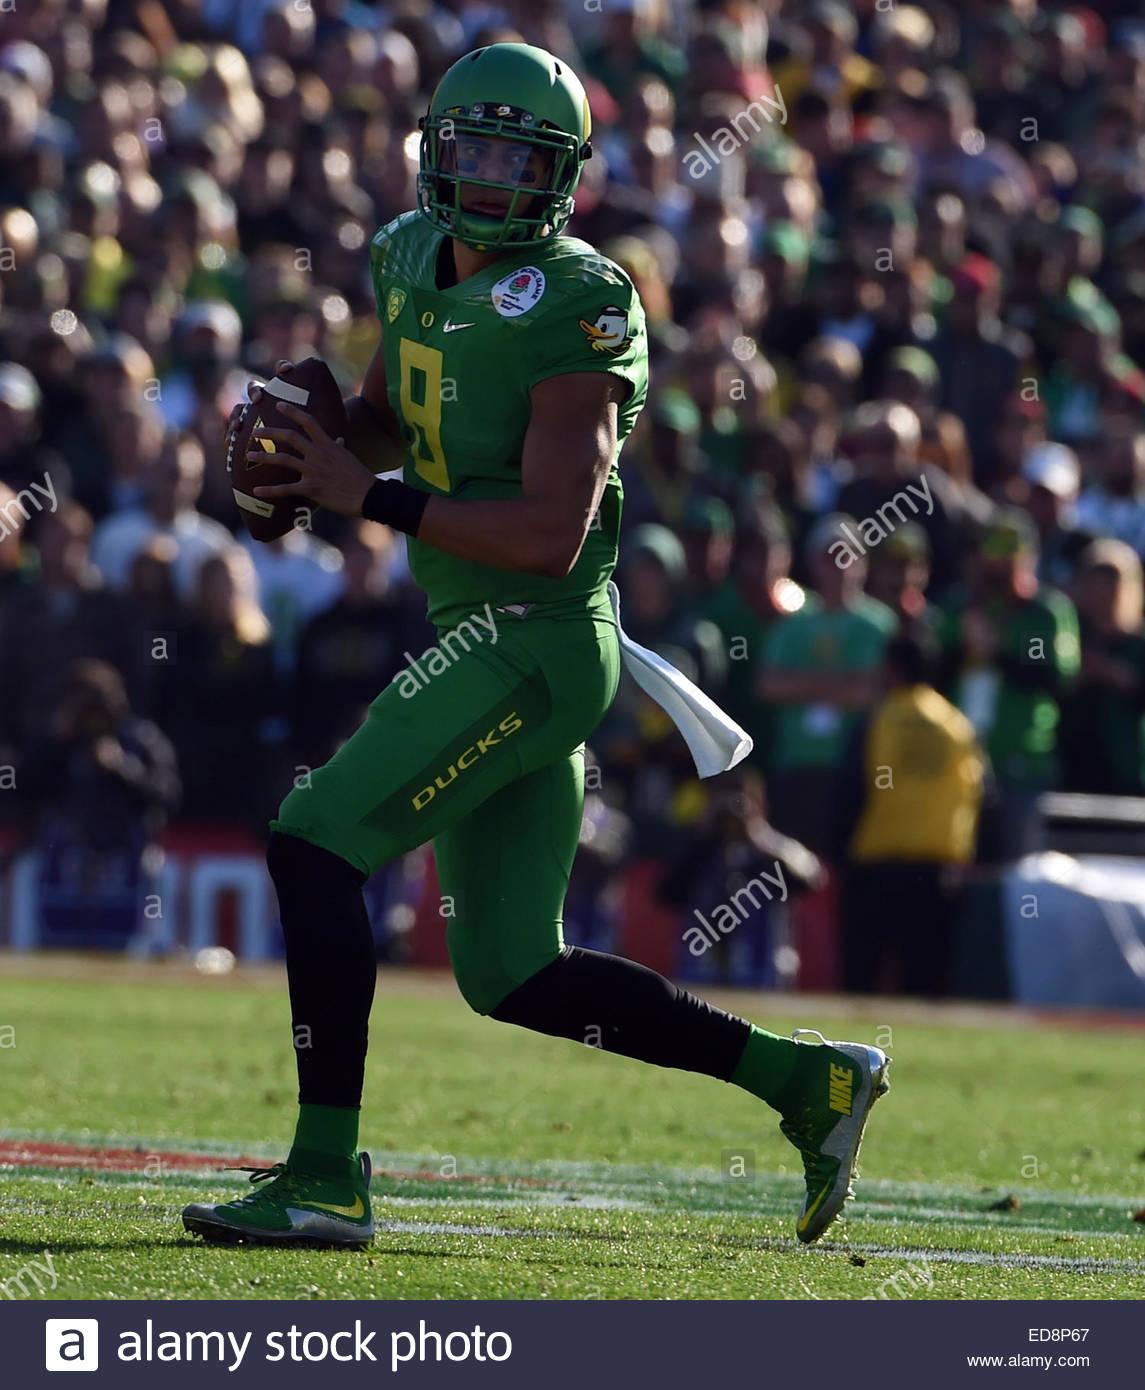 Pasadena, California, USA. 01st Jan, 2015. Oregon Ducks quarterback Marcus Mariota (8) scrambles against the Florida - Stock Image